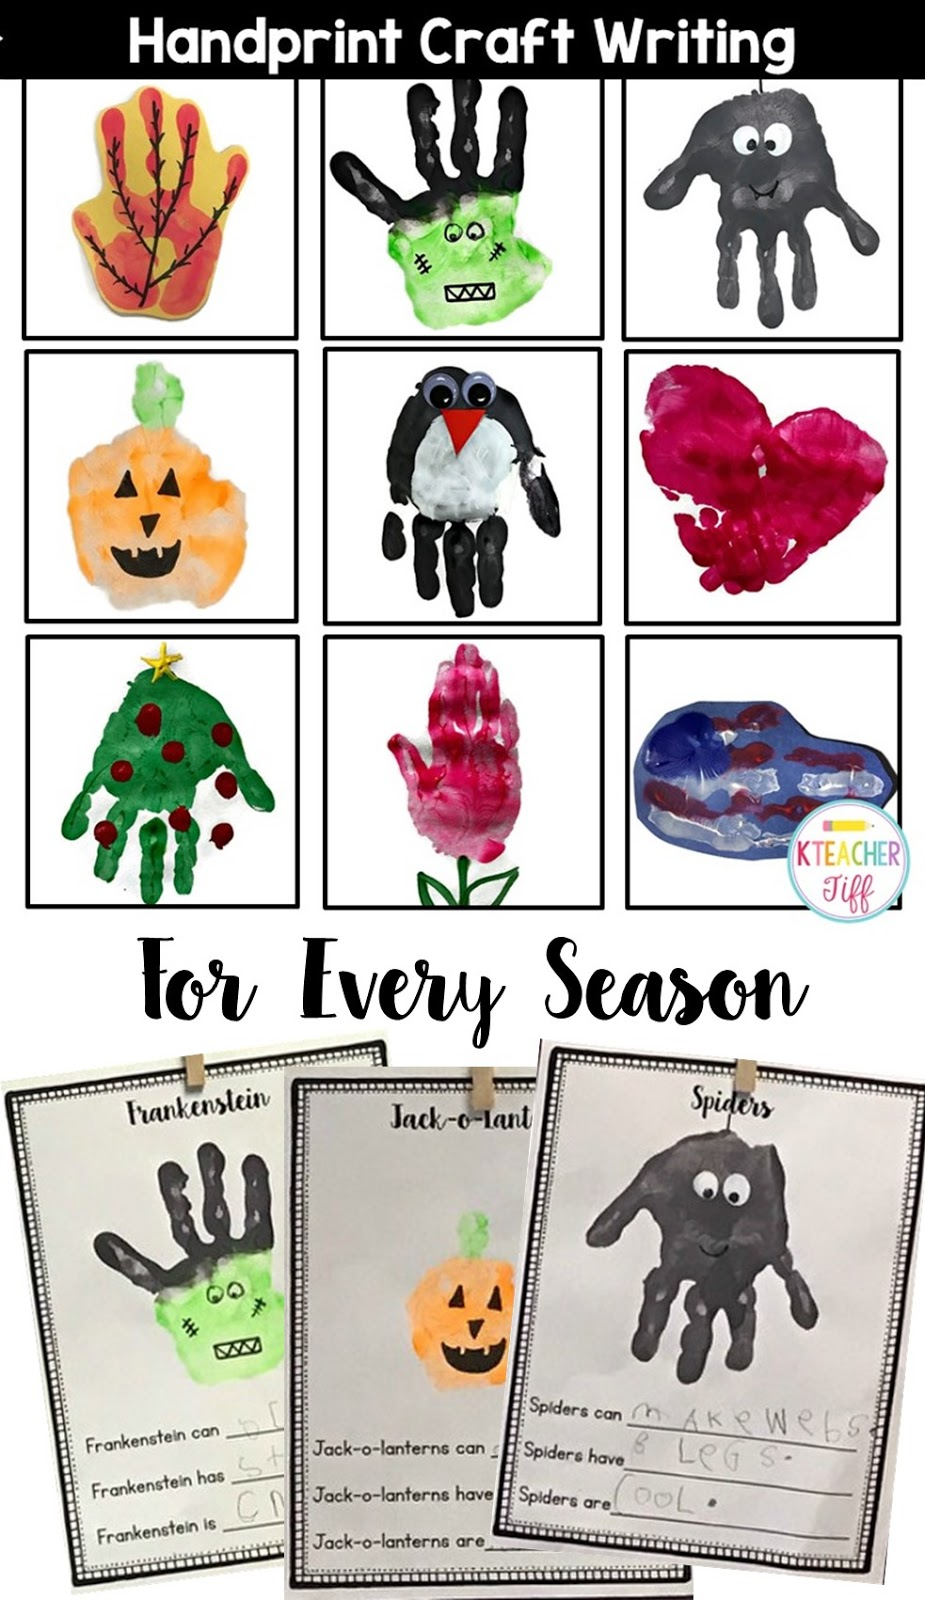 Calendar Art Ideas For Teachers : Seasonal and holiday handprint writing in kindergarten